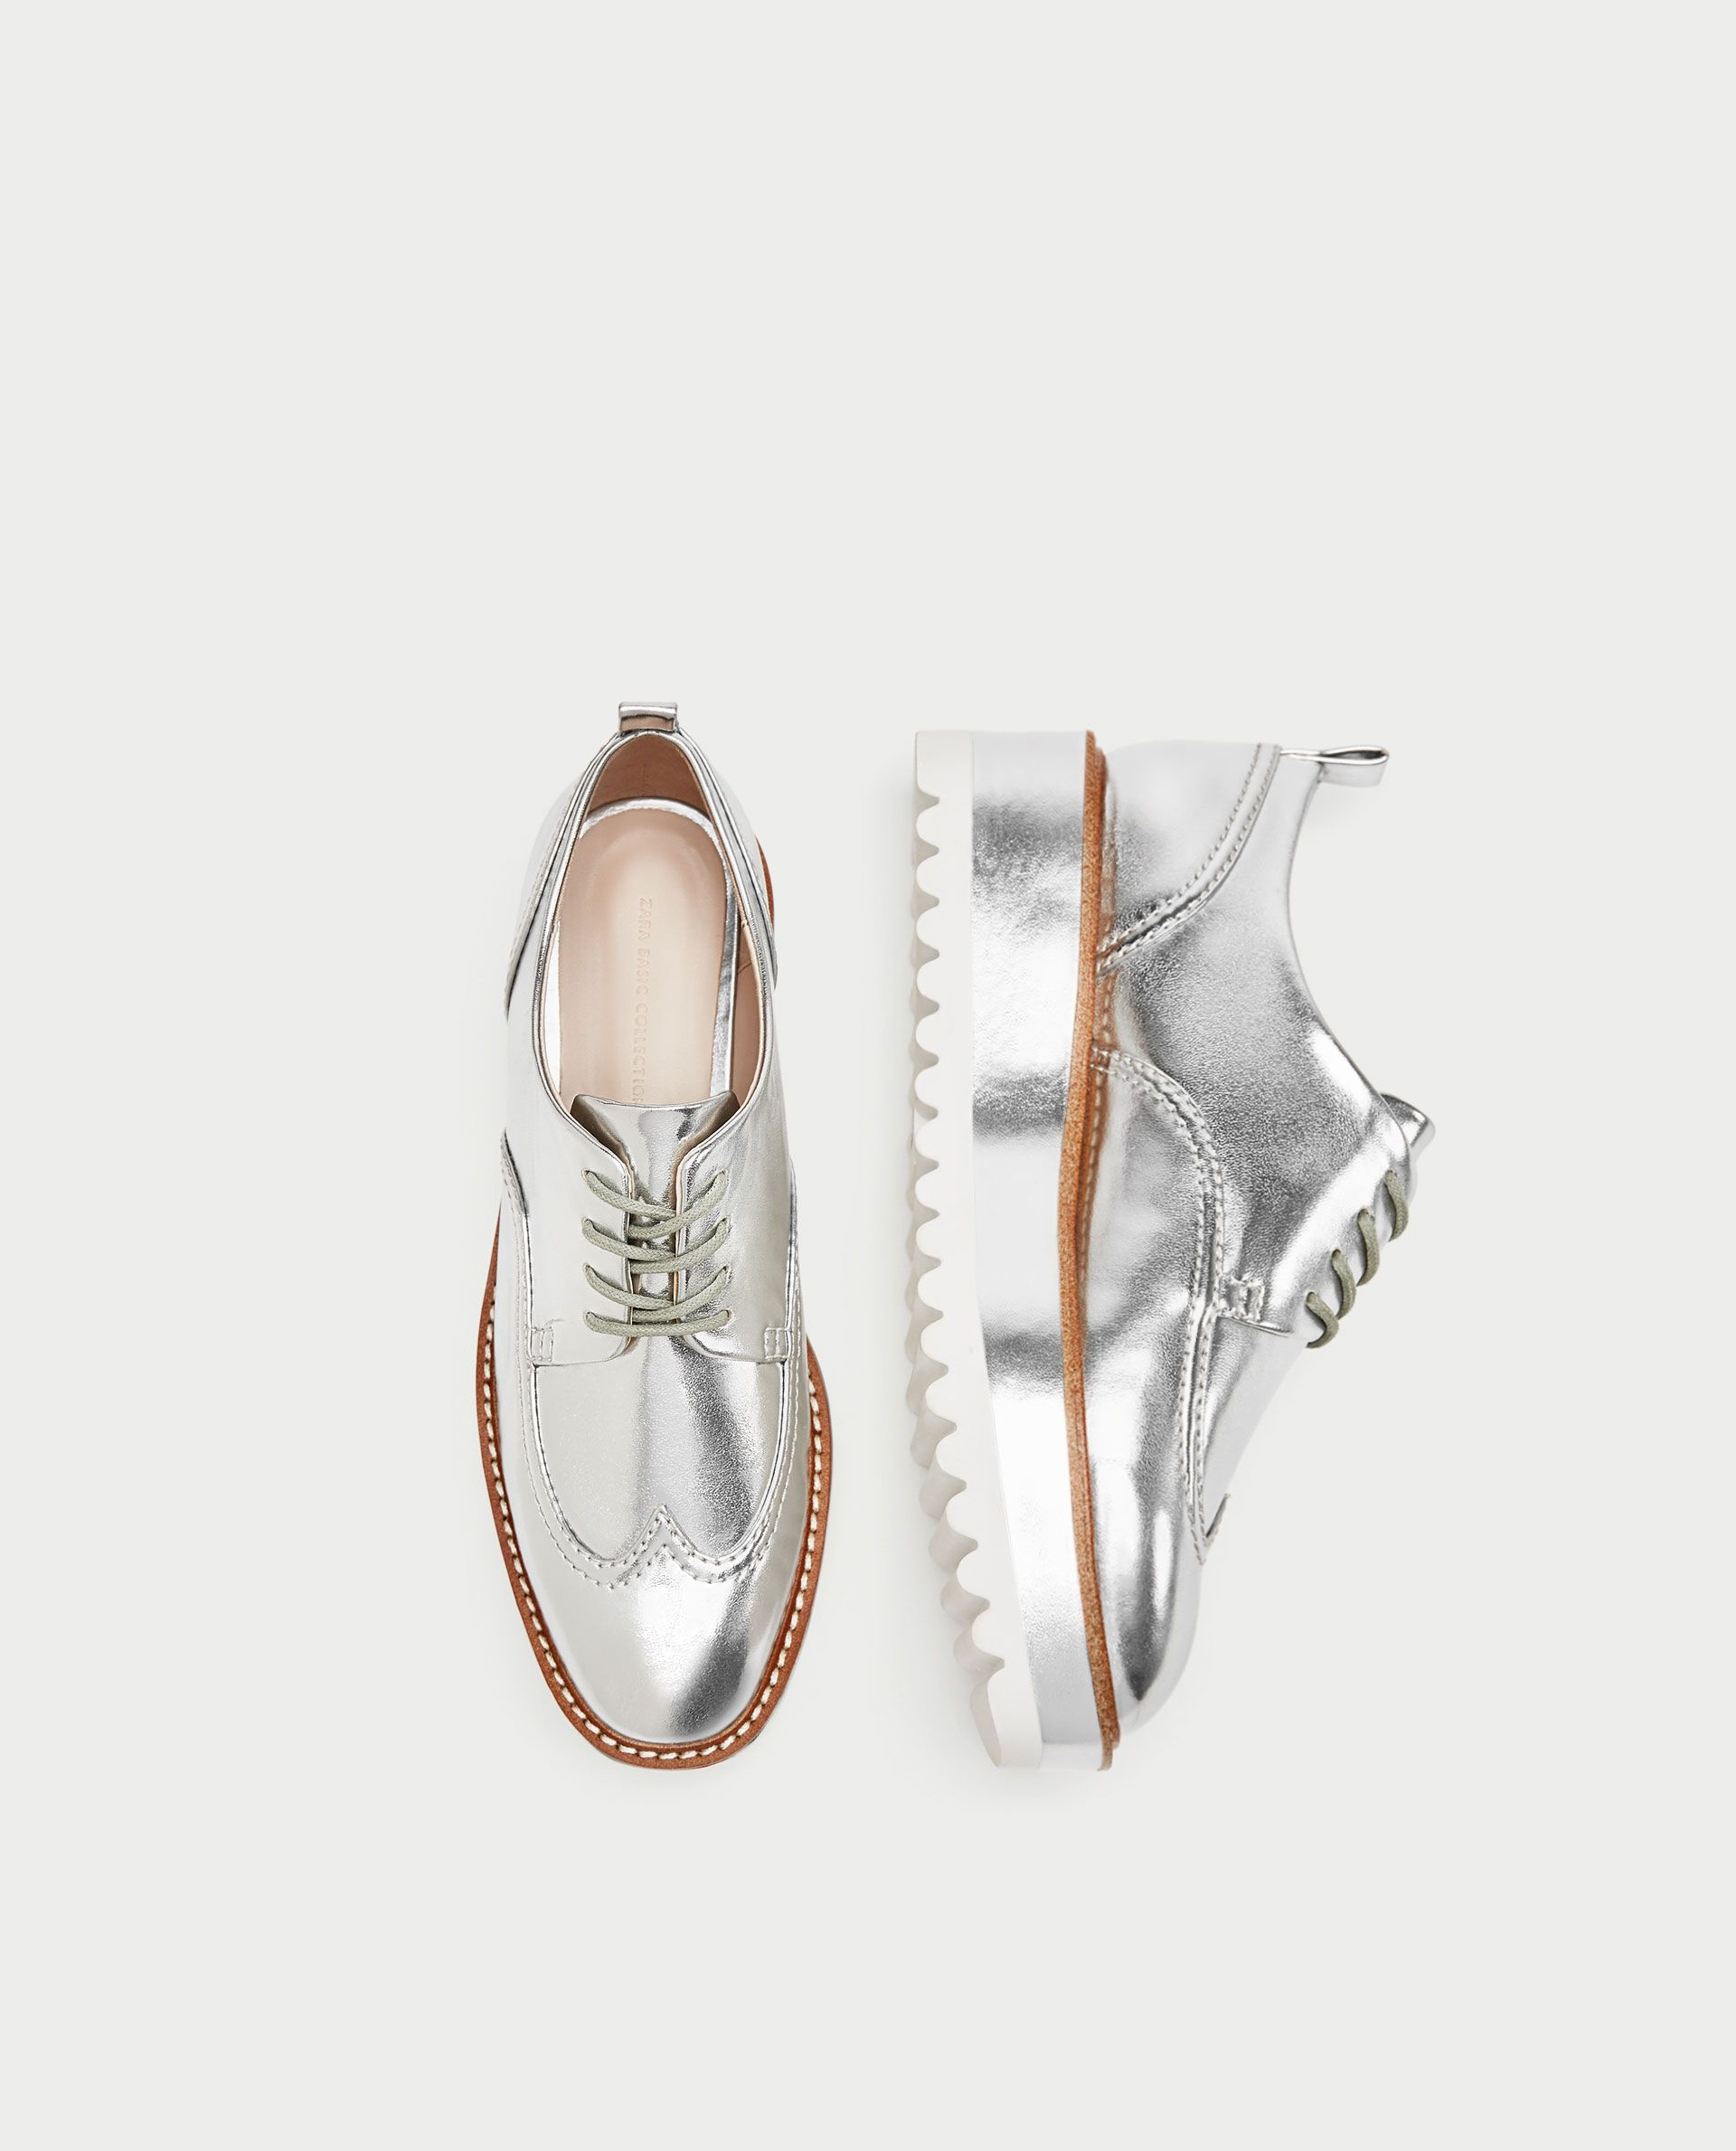 Blucher Pinterest Piso Track Zara Ensueño Zapatos De Plateado r6rwpqU 067b96b6d157